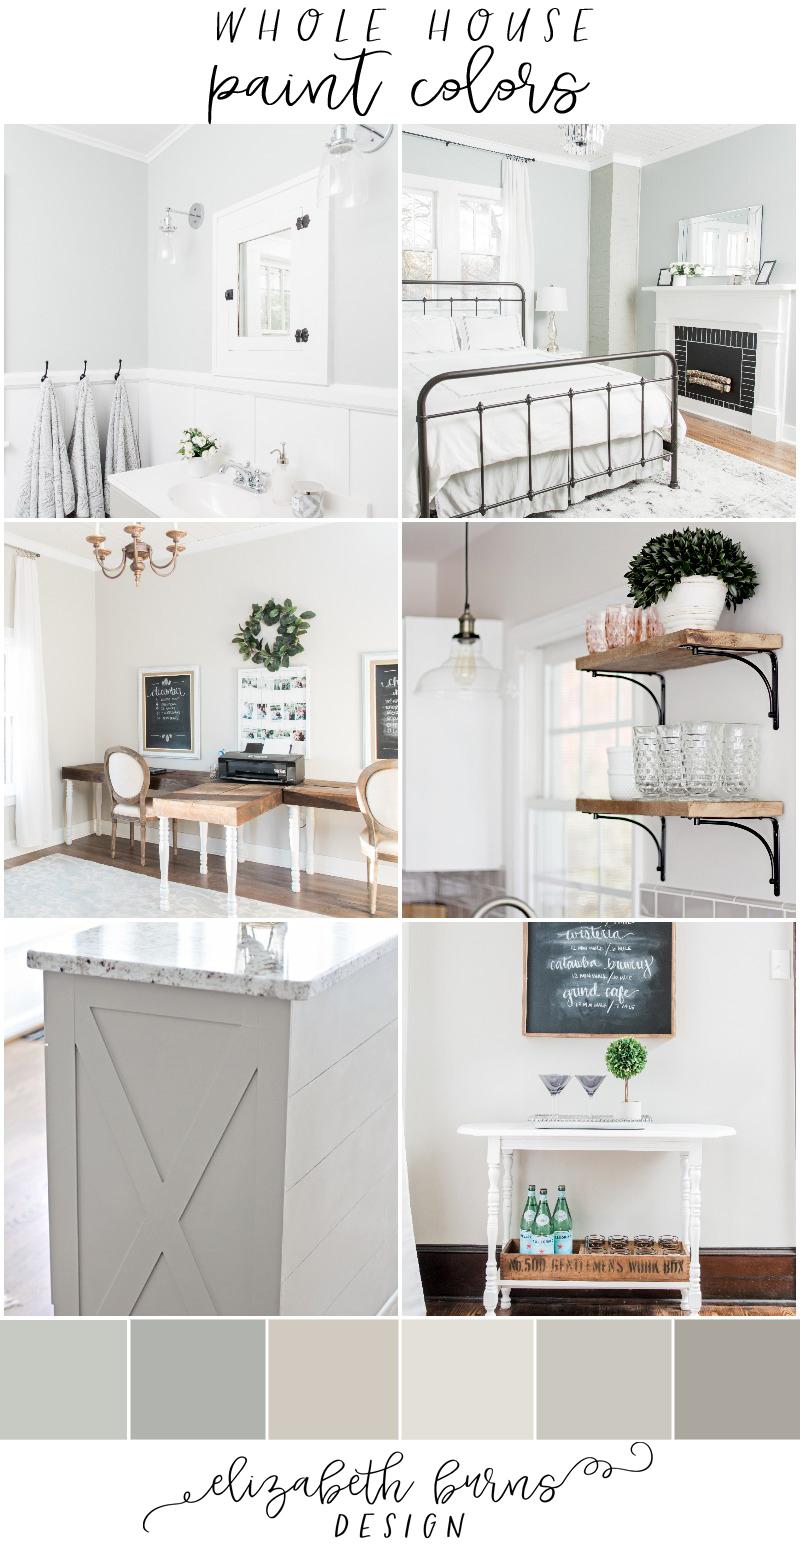 Whole House Paint Color Scheme With Photos Elizabeth Burns Design Raleigh Nc Interior Designer